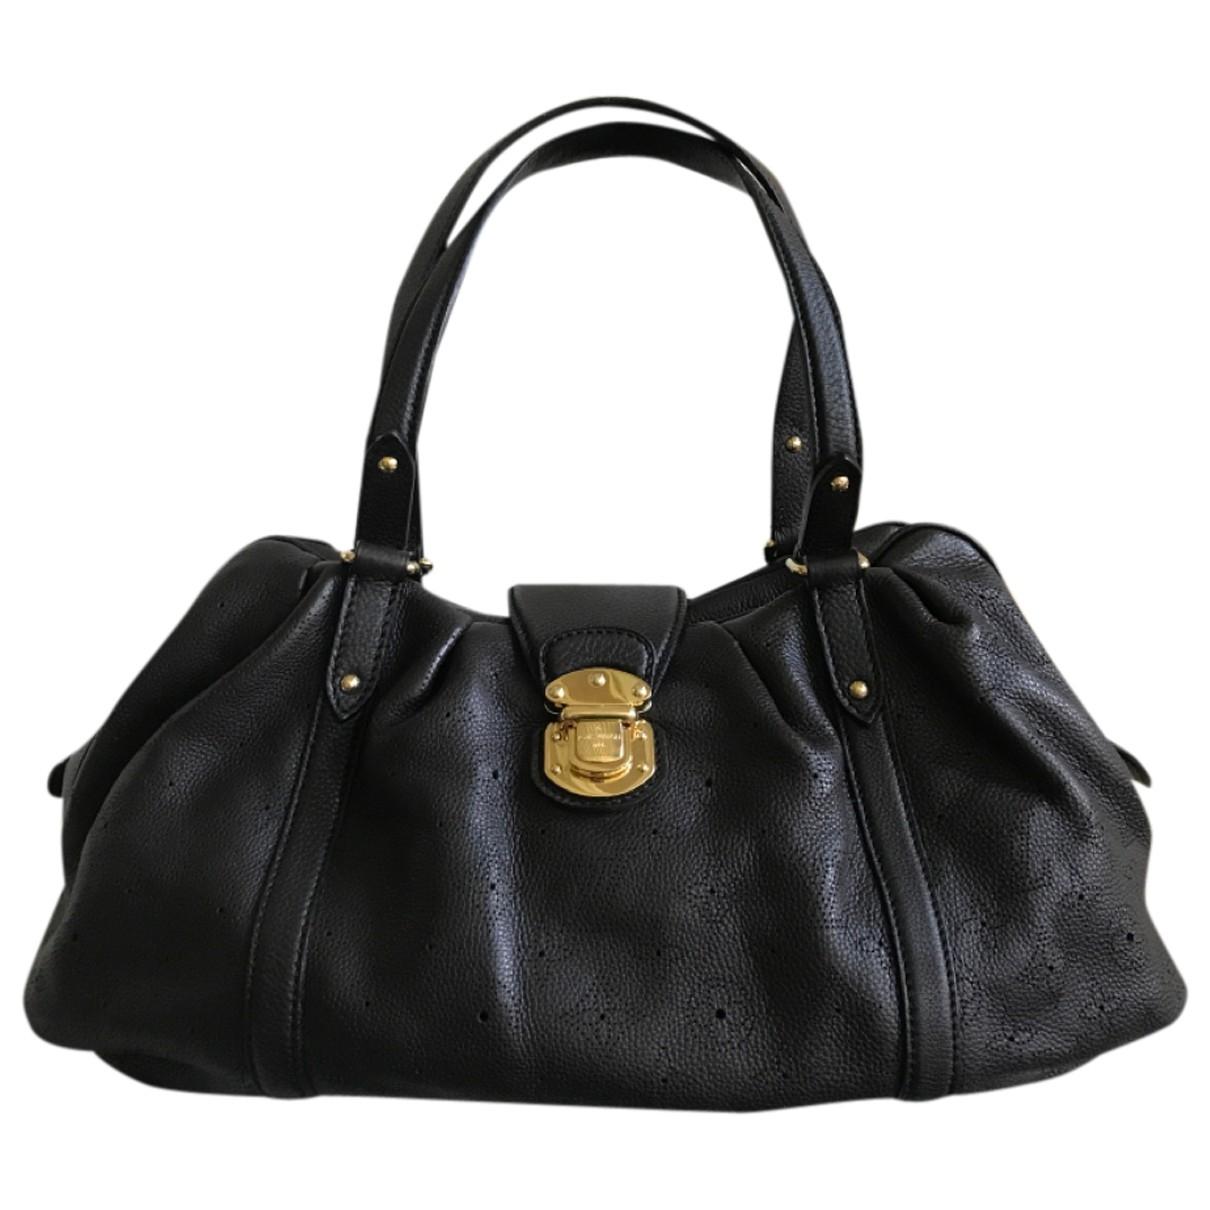 Louis Vuitton Mahina Handtasche in  Schwarz Leder